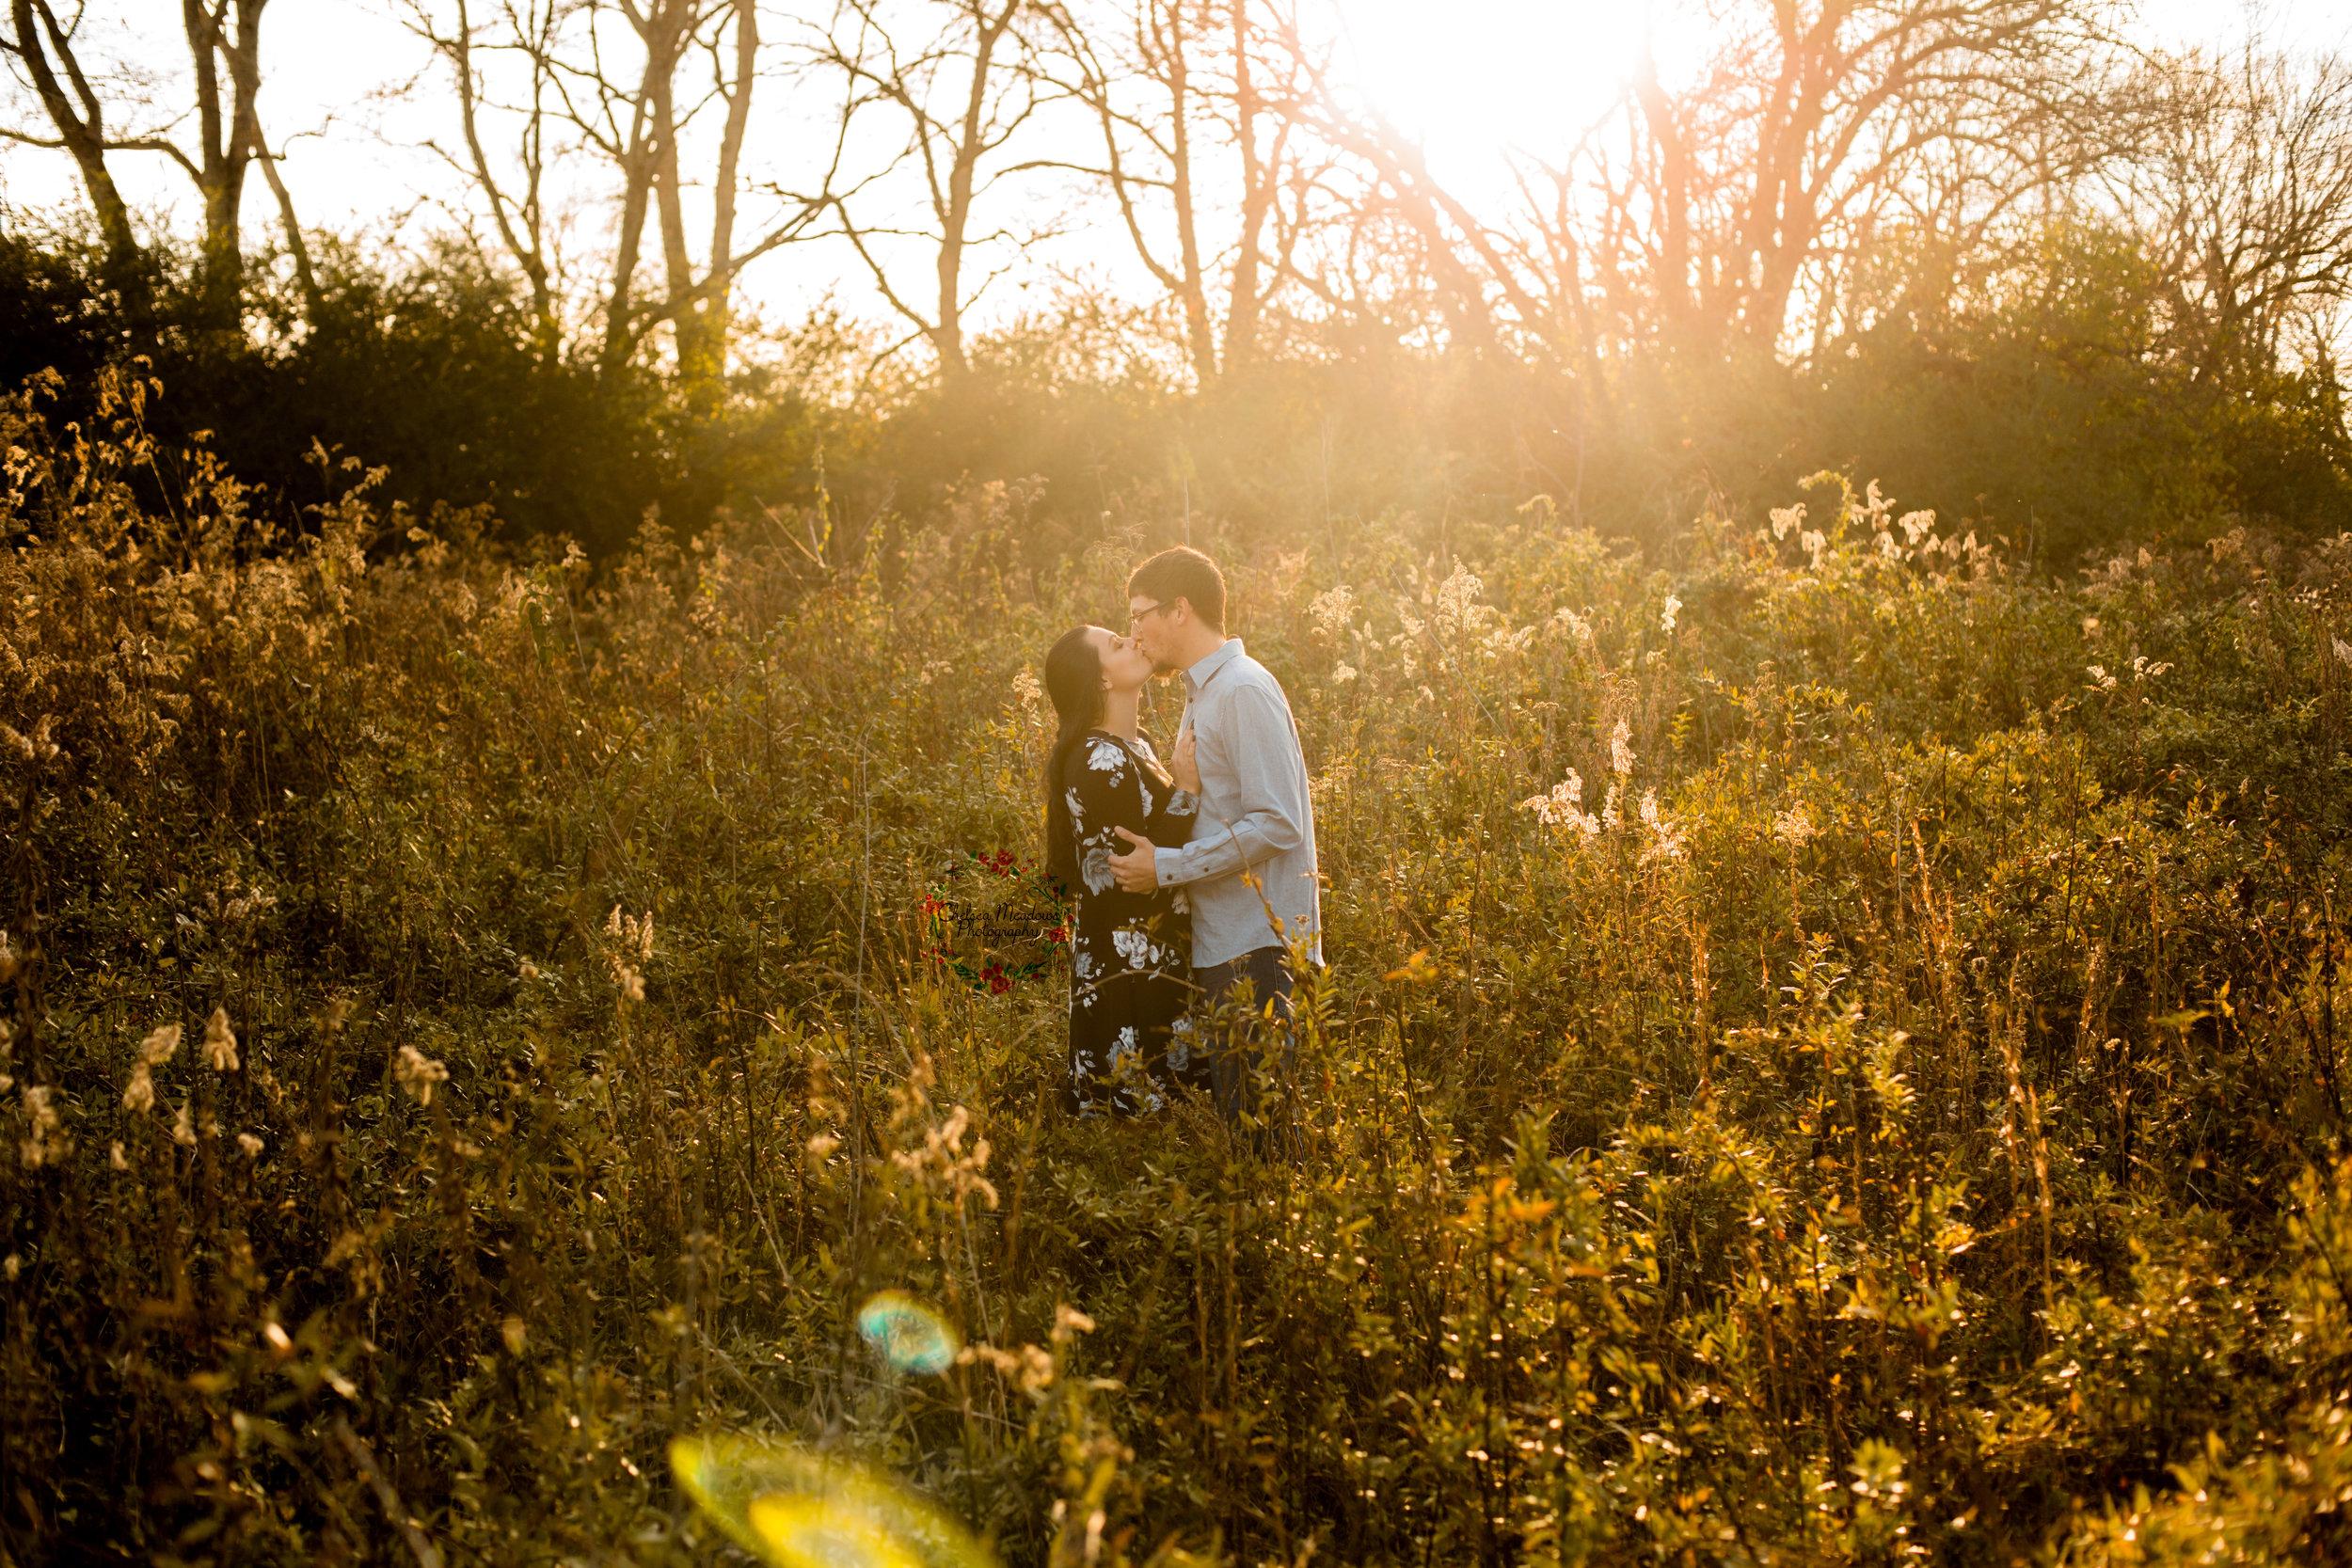 Jessica & Derek Engagement - Nashville Wedding Photographer - Chelsea Meadows Photography (37).jpg